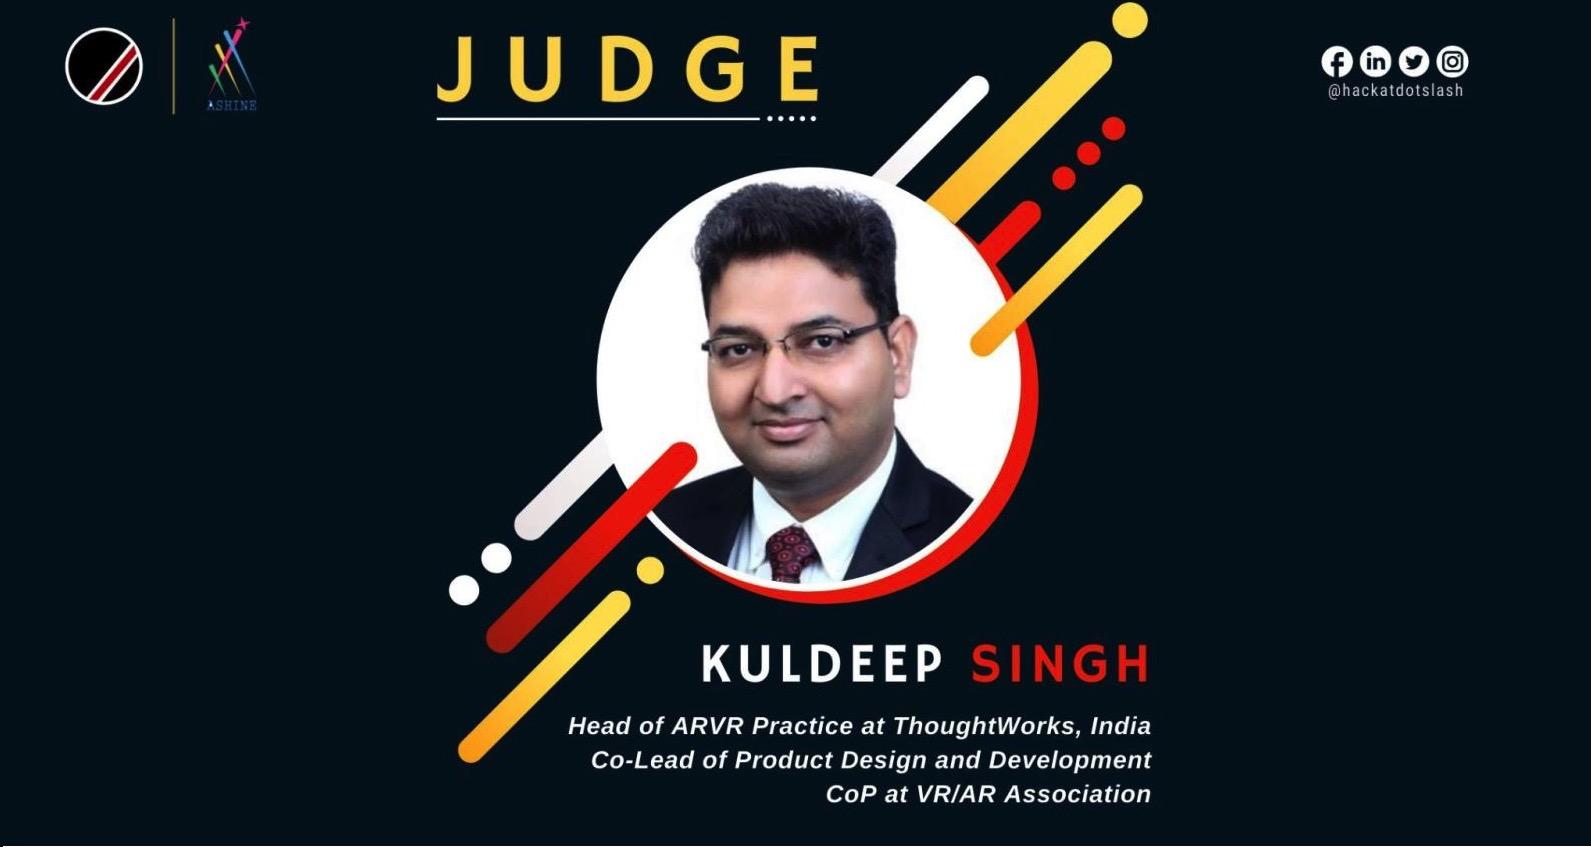 image from Judge - DotStash 4.0 - Hackthon by NIT Surat